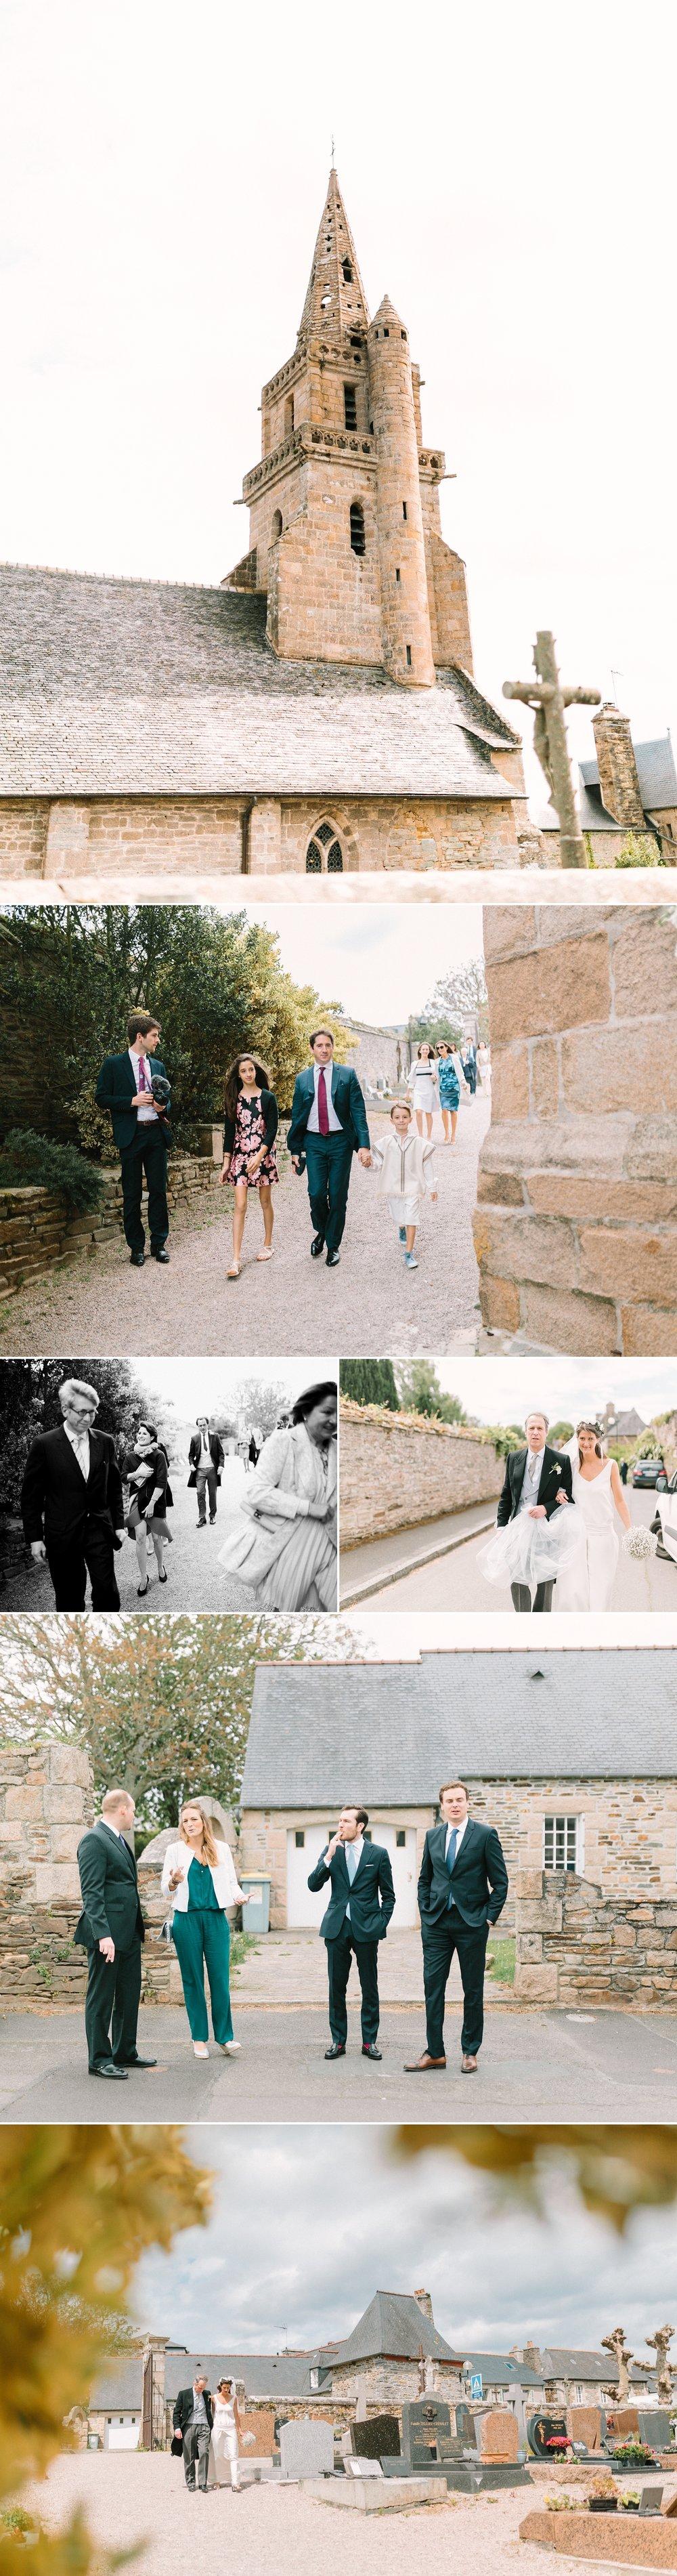 04 COUPLE- Pia & Charles-Henri-4.jpg